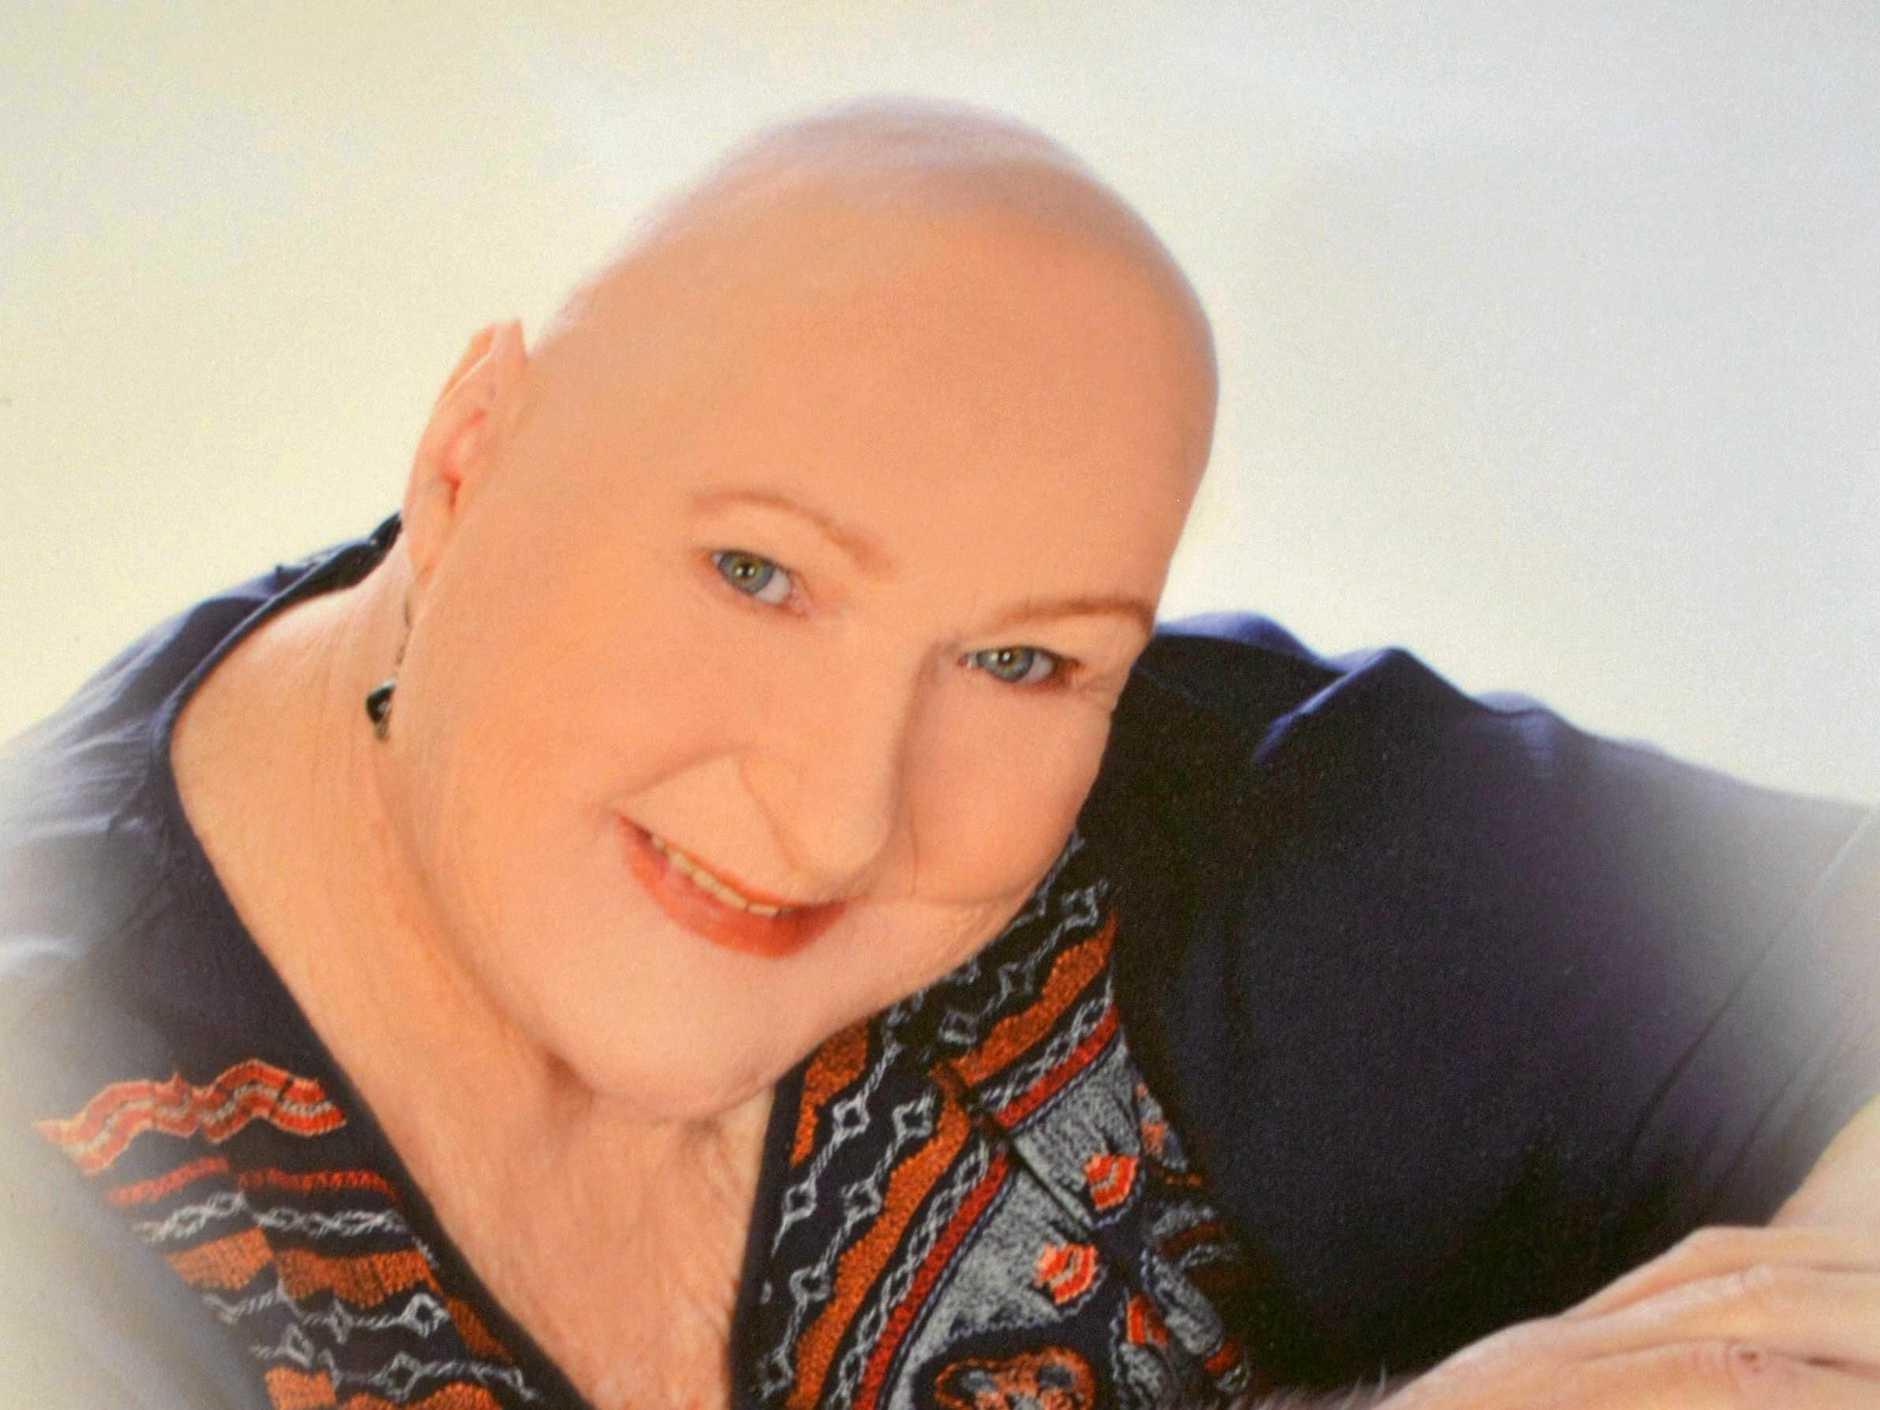 Kingaroy resident Linda Allen passed away on December 11, 2018 after her short battle with lung cancer.